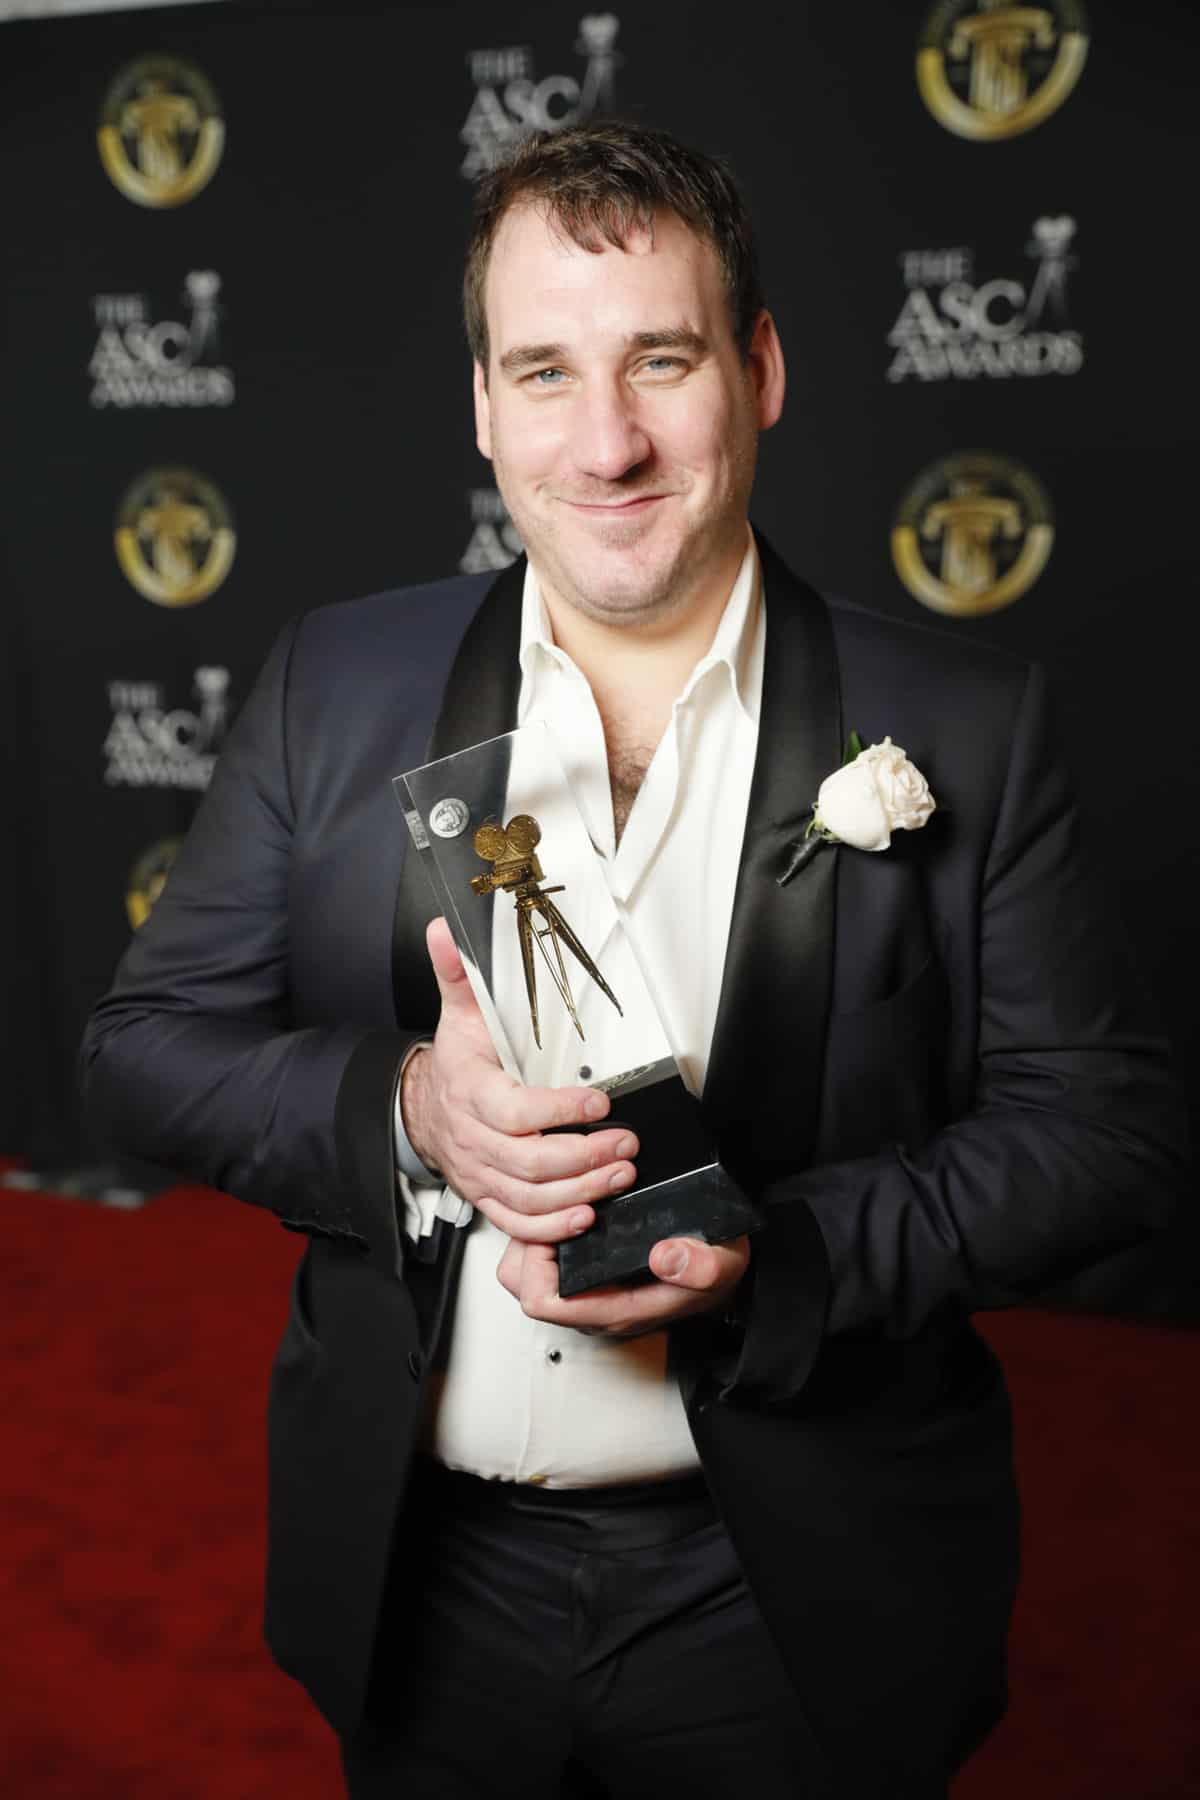 James Friend BSC and his ASC Award for <em>Patrick Melrose</em>